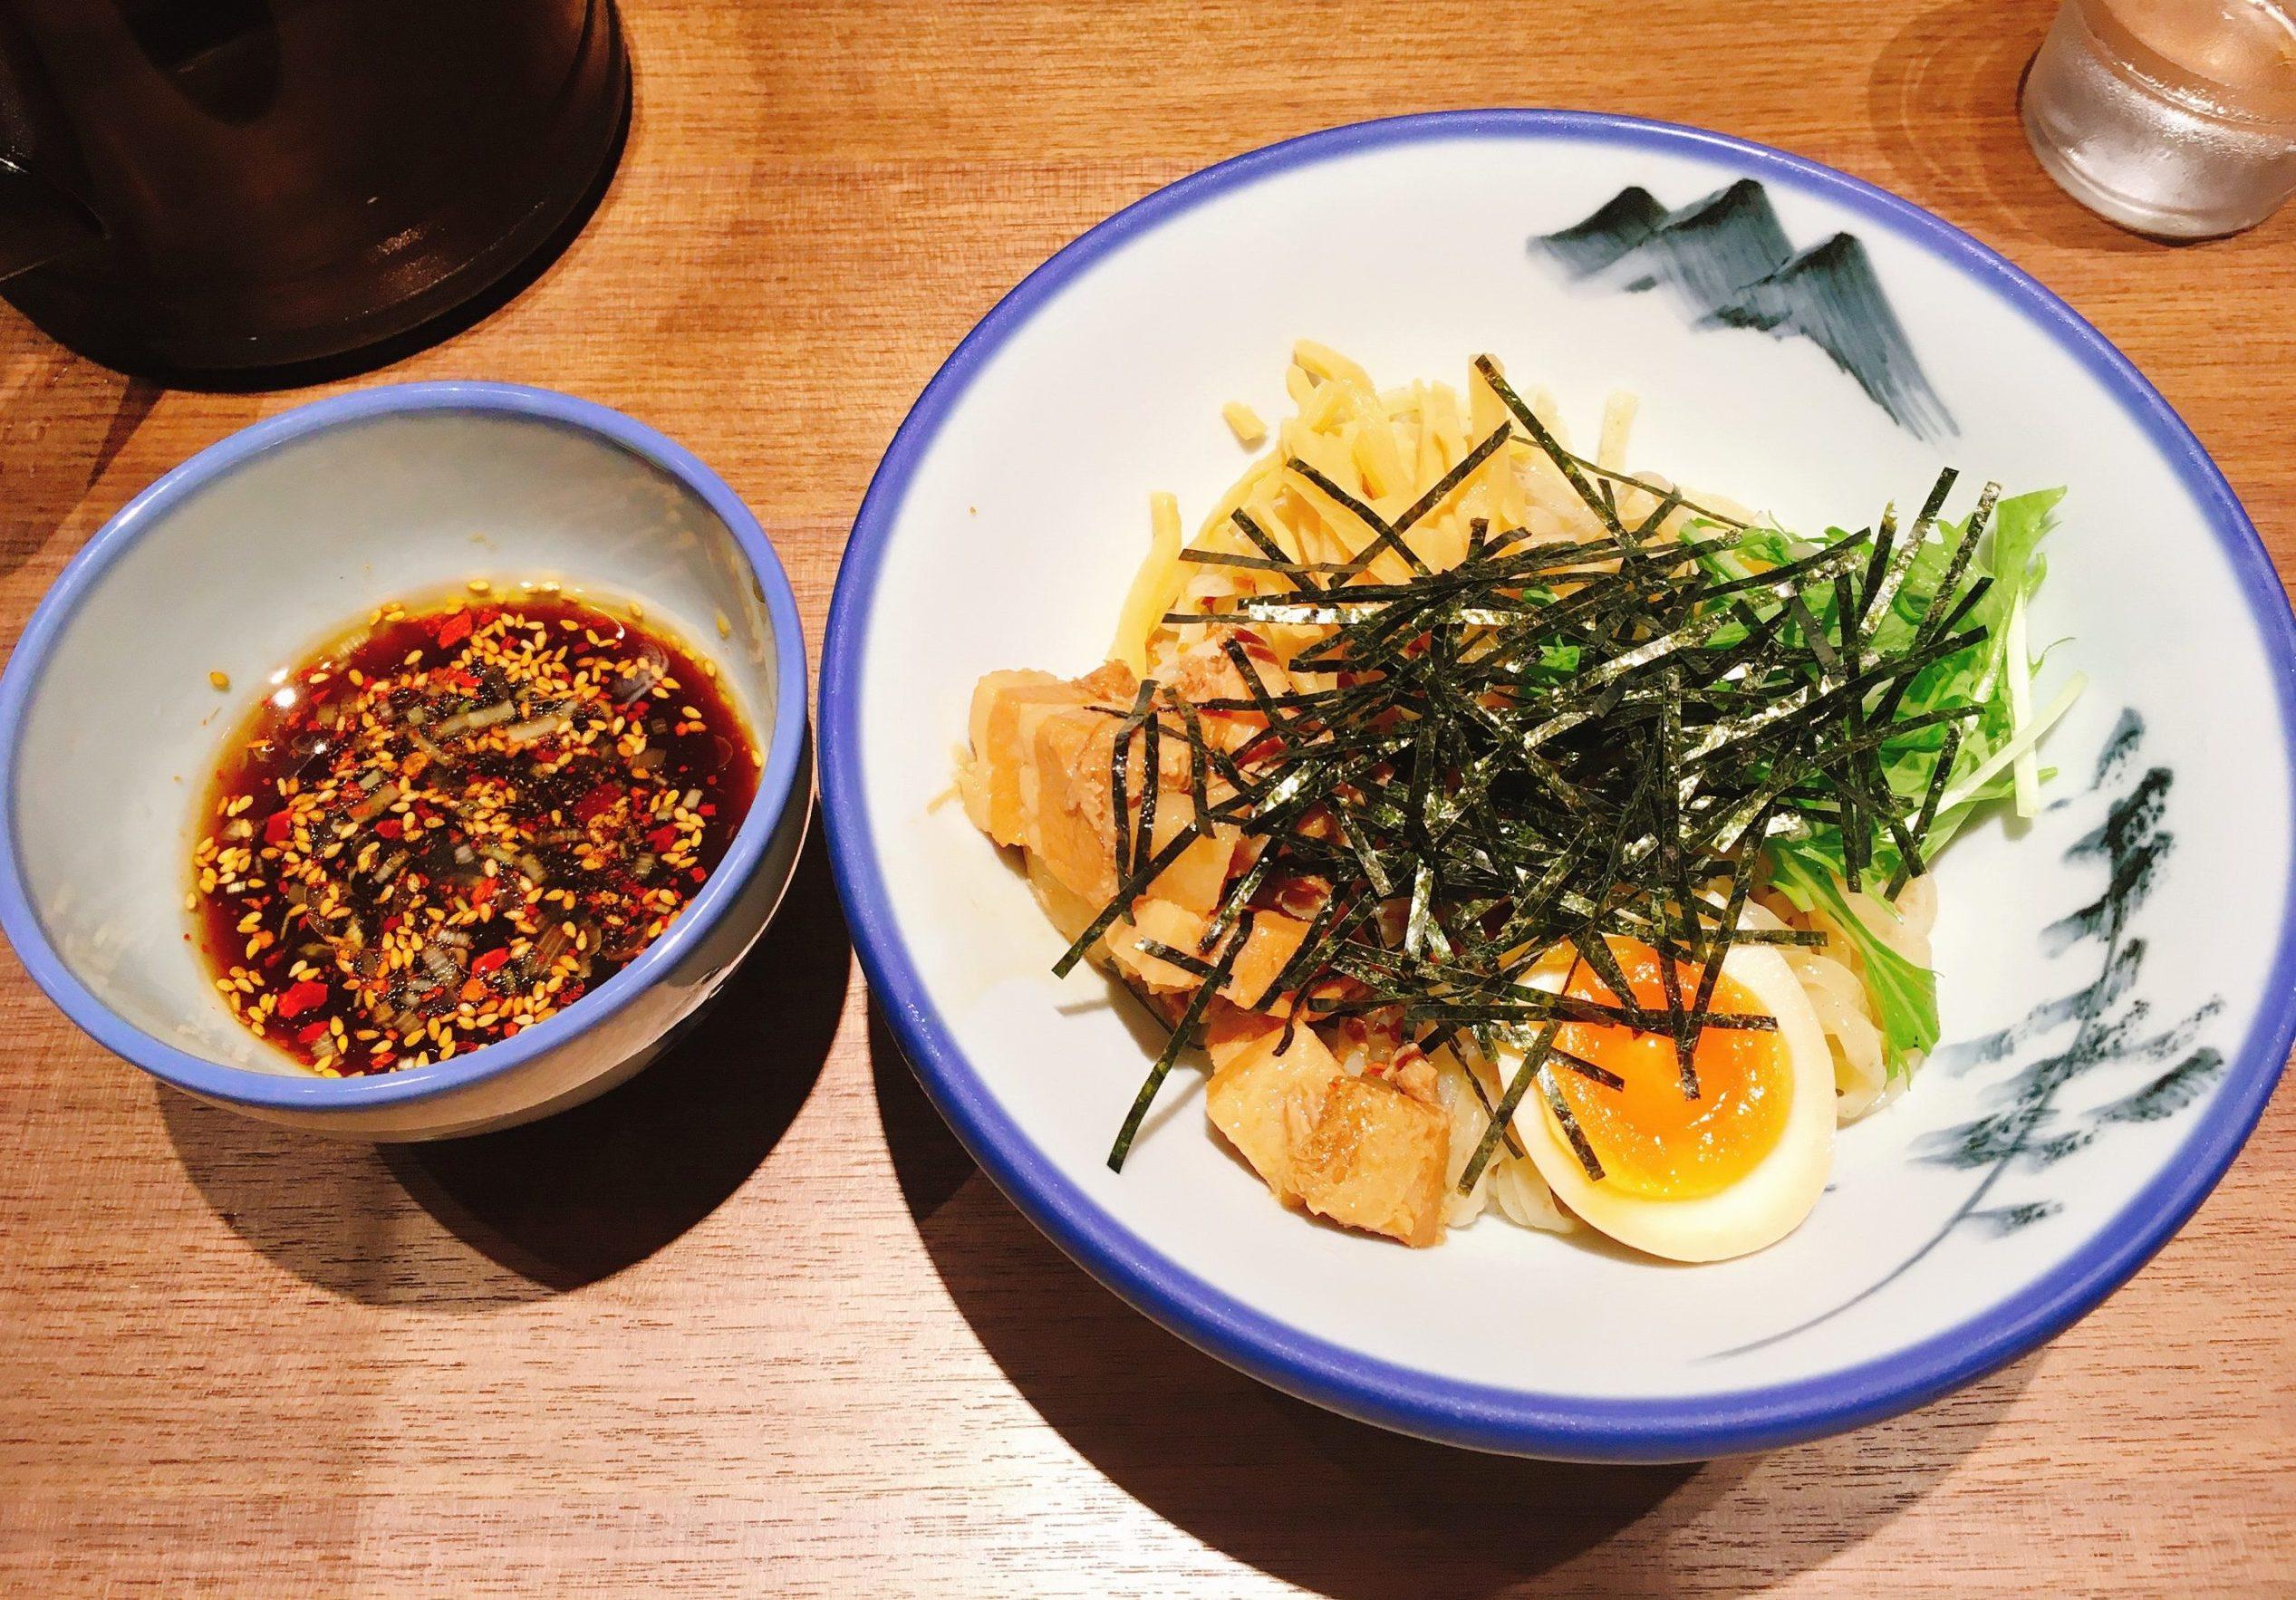 AFURI新宿住友ビル店の柚子露つけ麺の写真